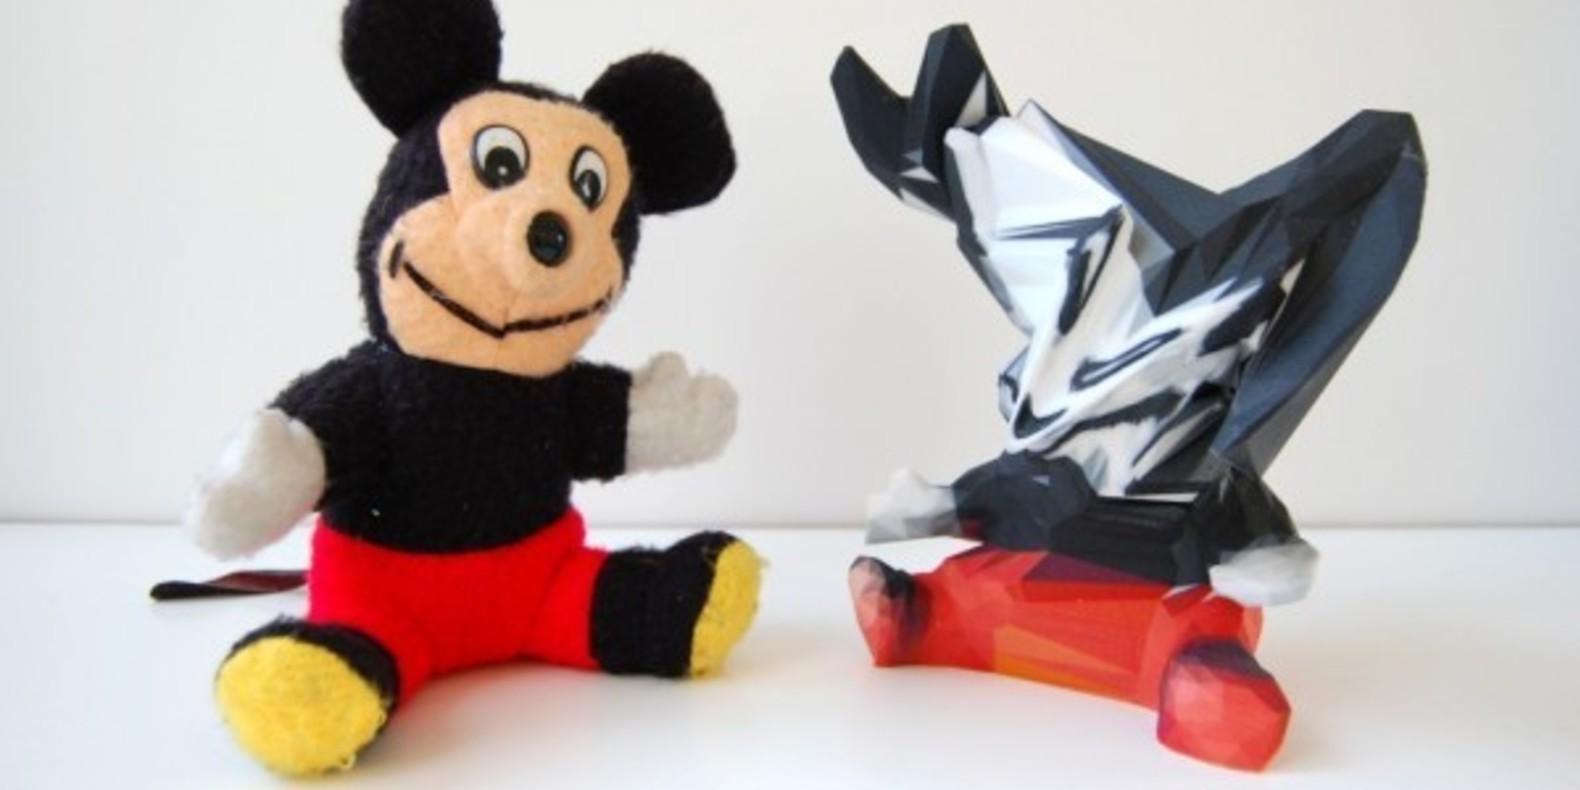 sekuMoiMecy Matthew Plummer-Fernandez impression 3D printing cults fichier mickey mouse 6